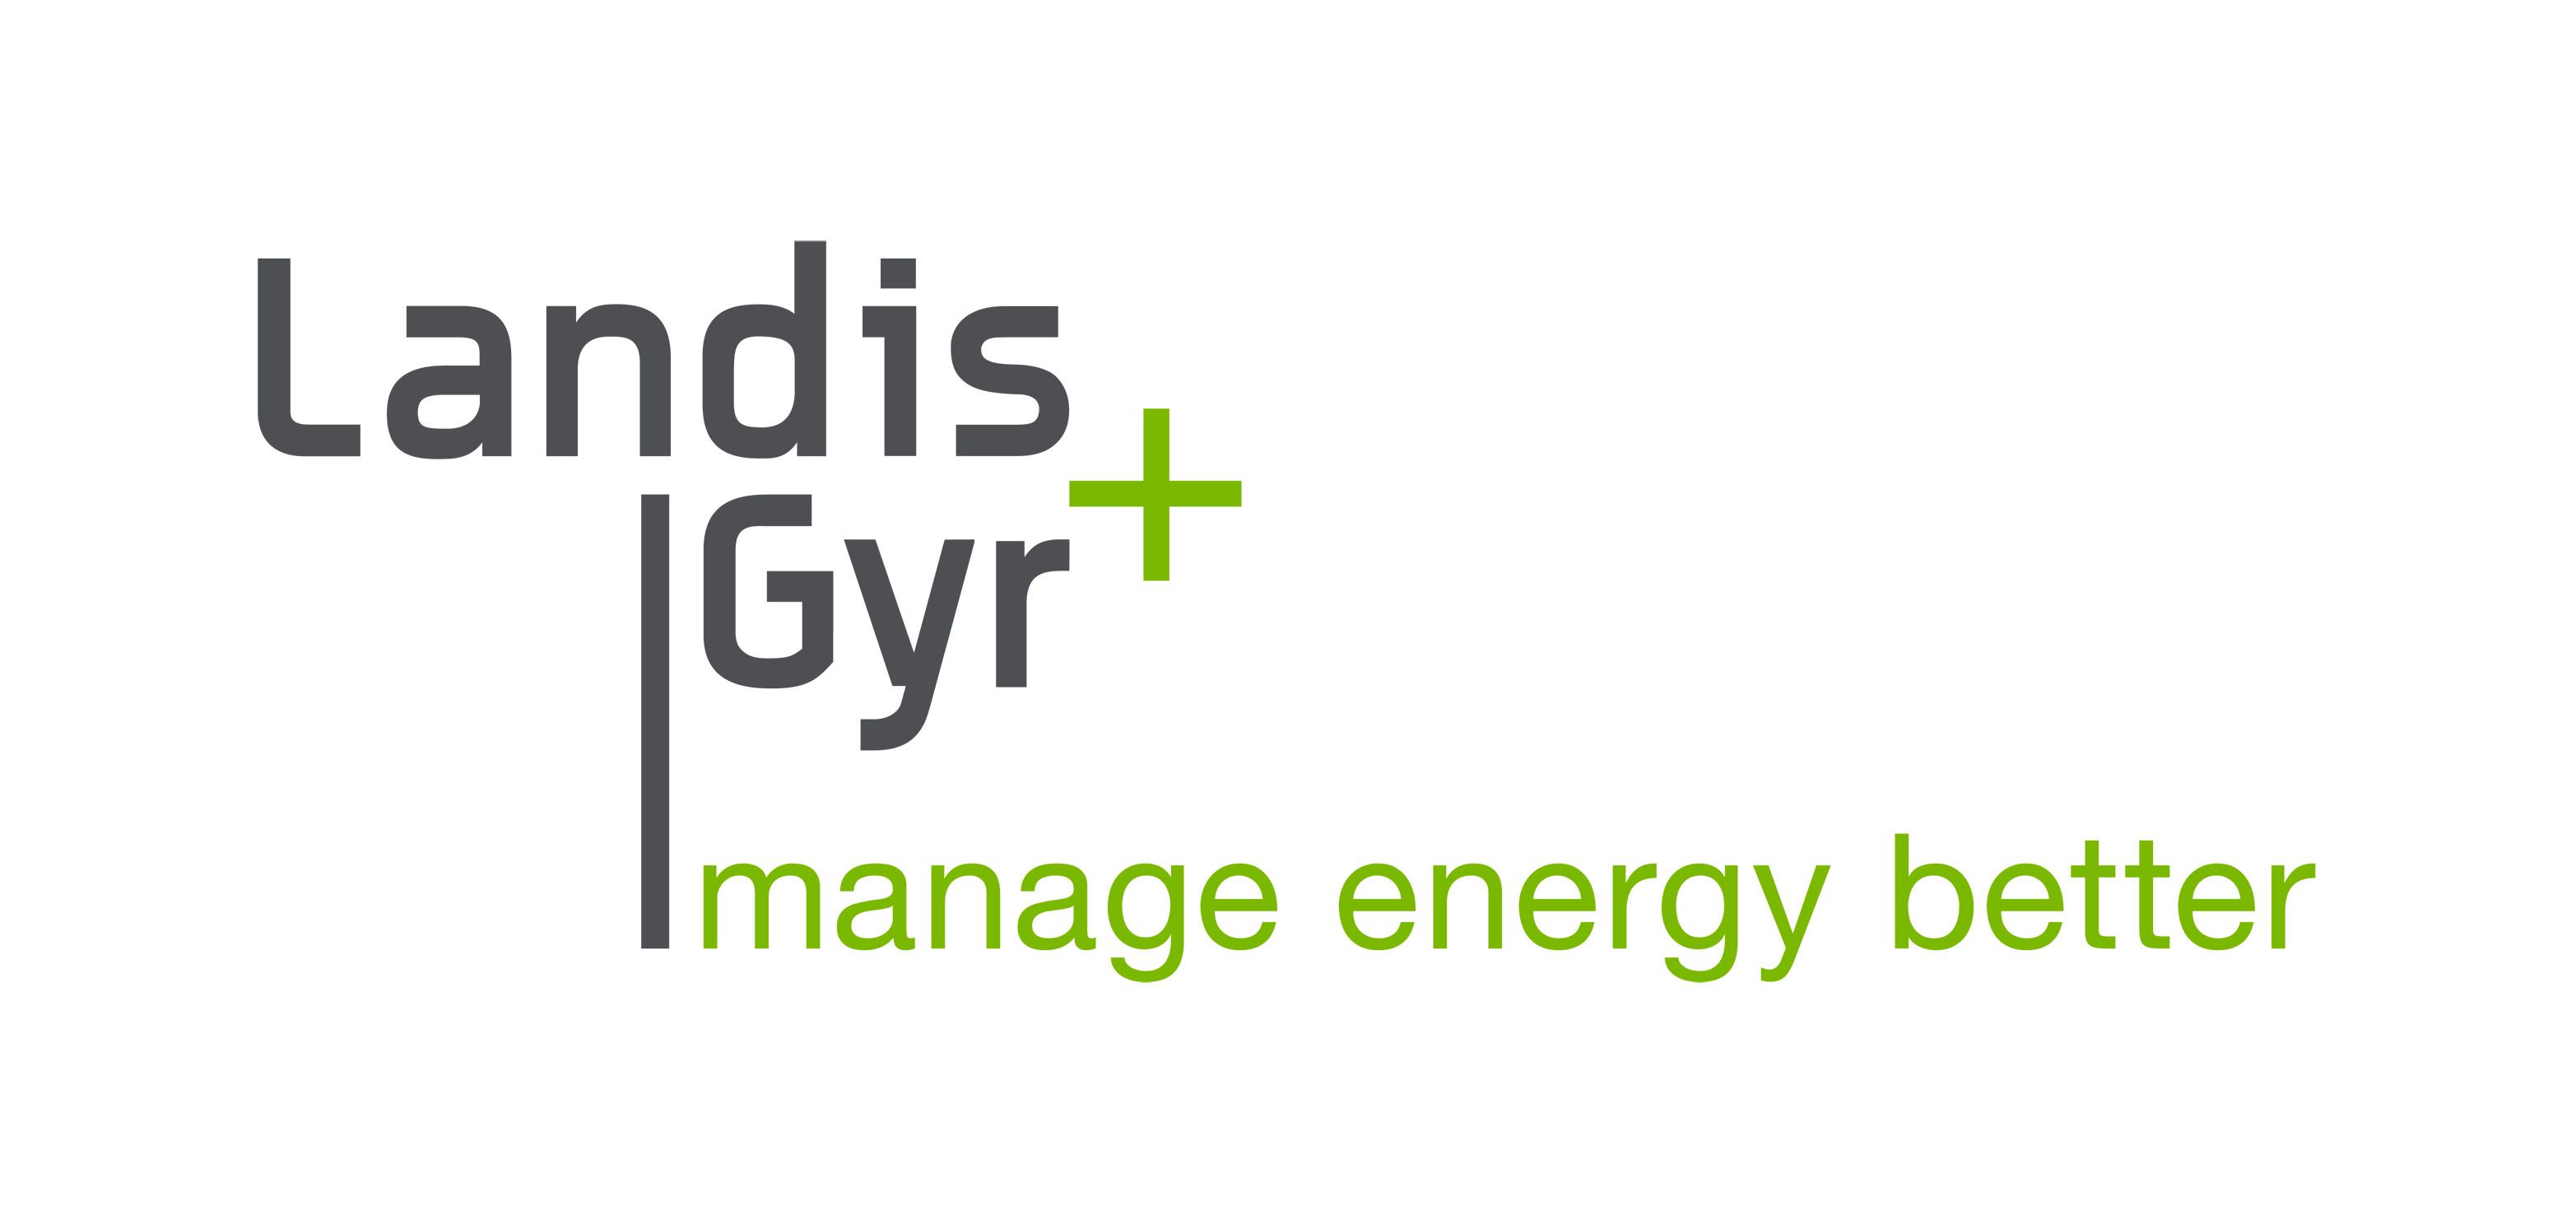 landis-gyr-user-interface-designer-global-sw-platform-team-jyvaskyla-smsol-3409553 logo